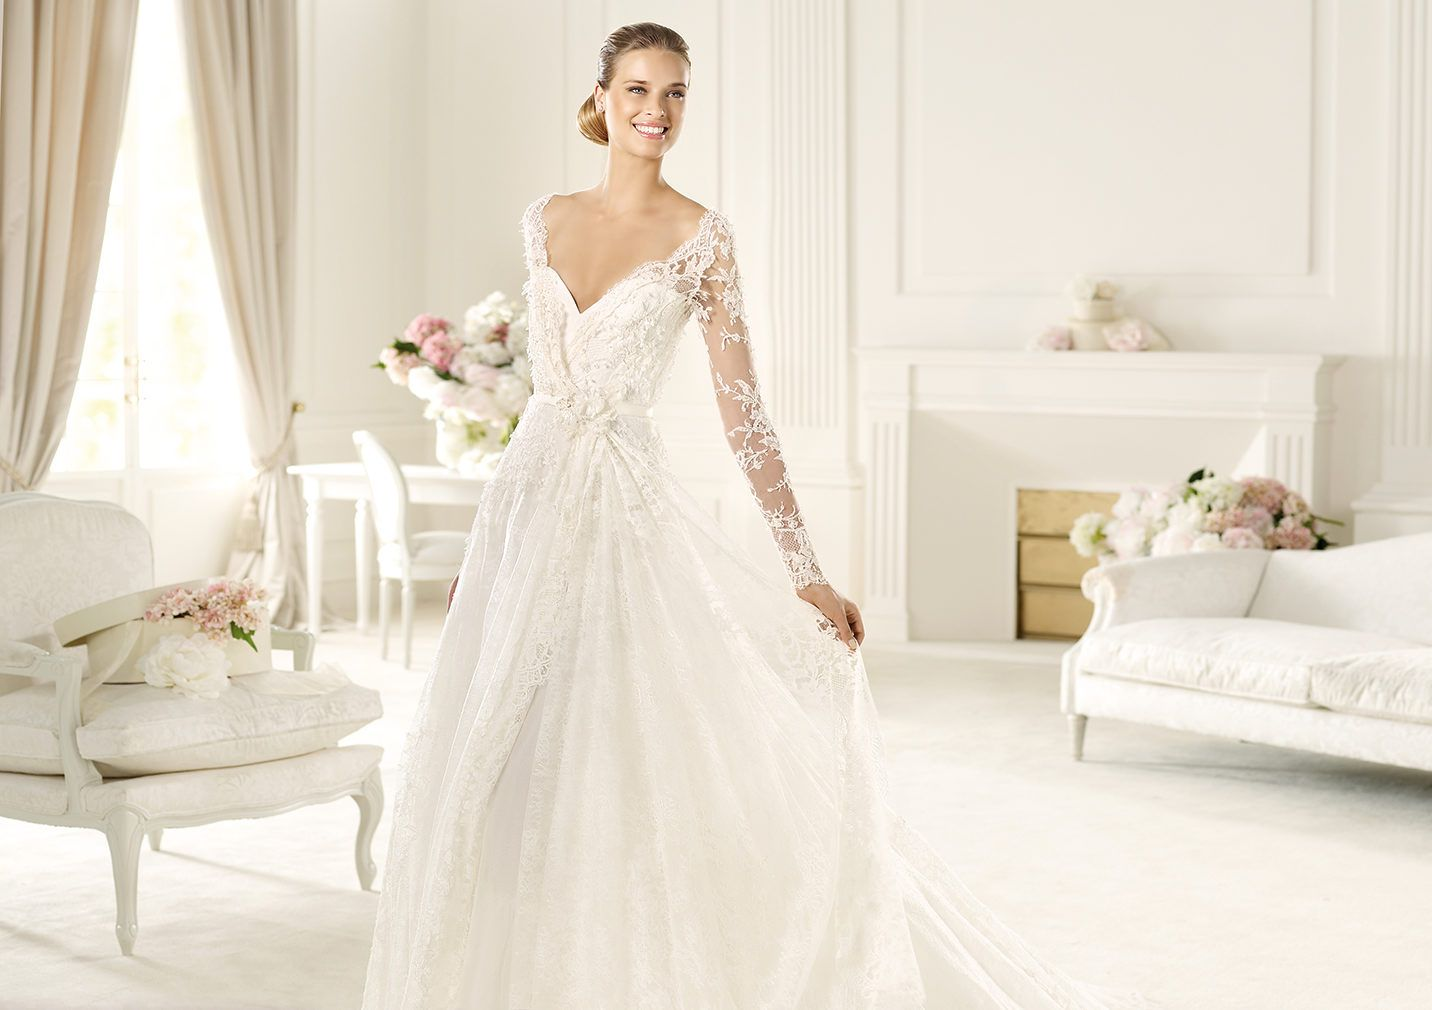 Elie saab collection birgit model wedding dresses